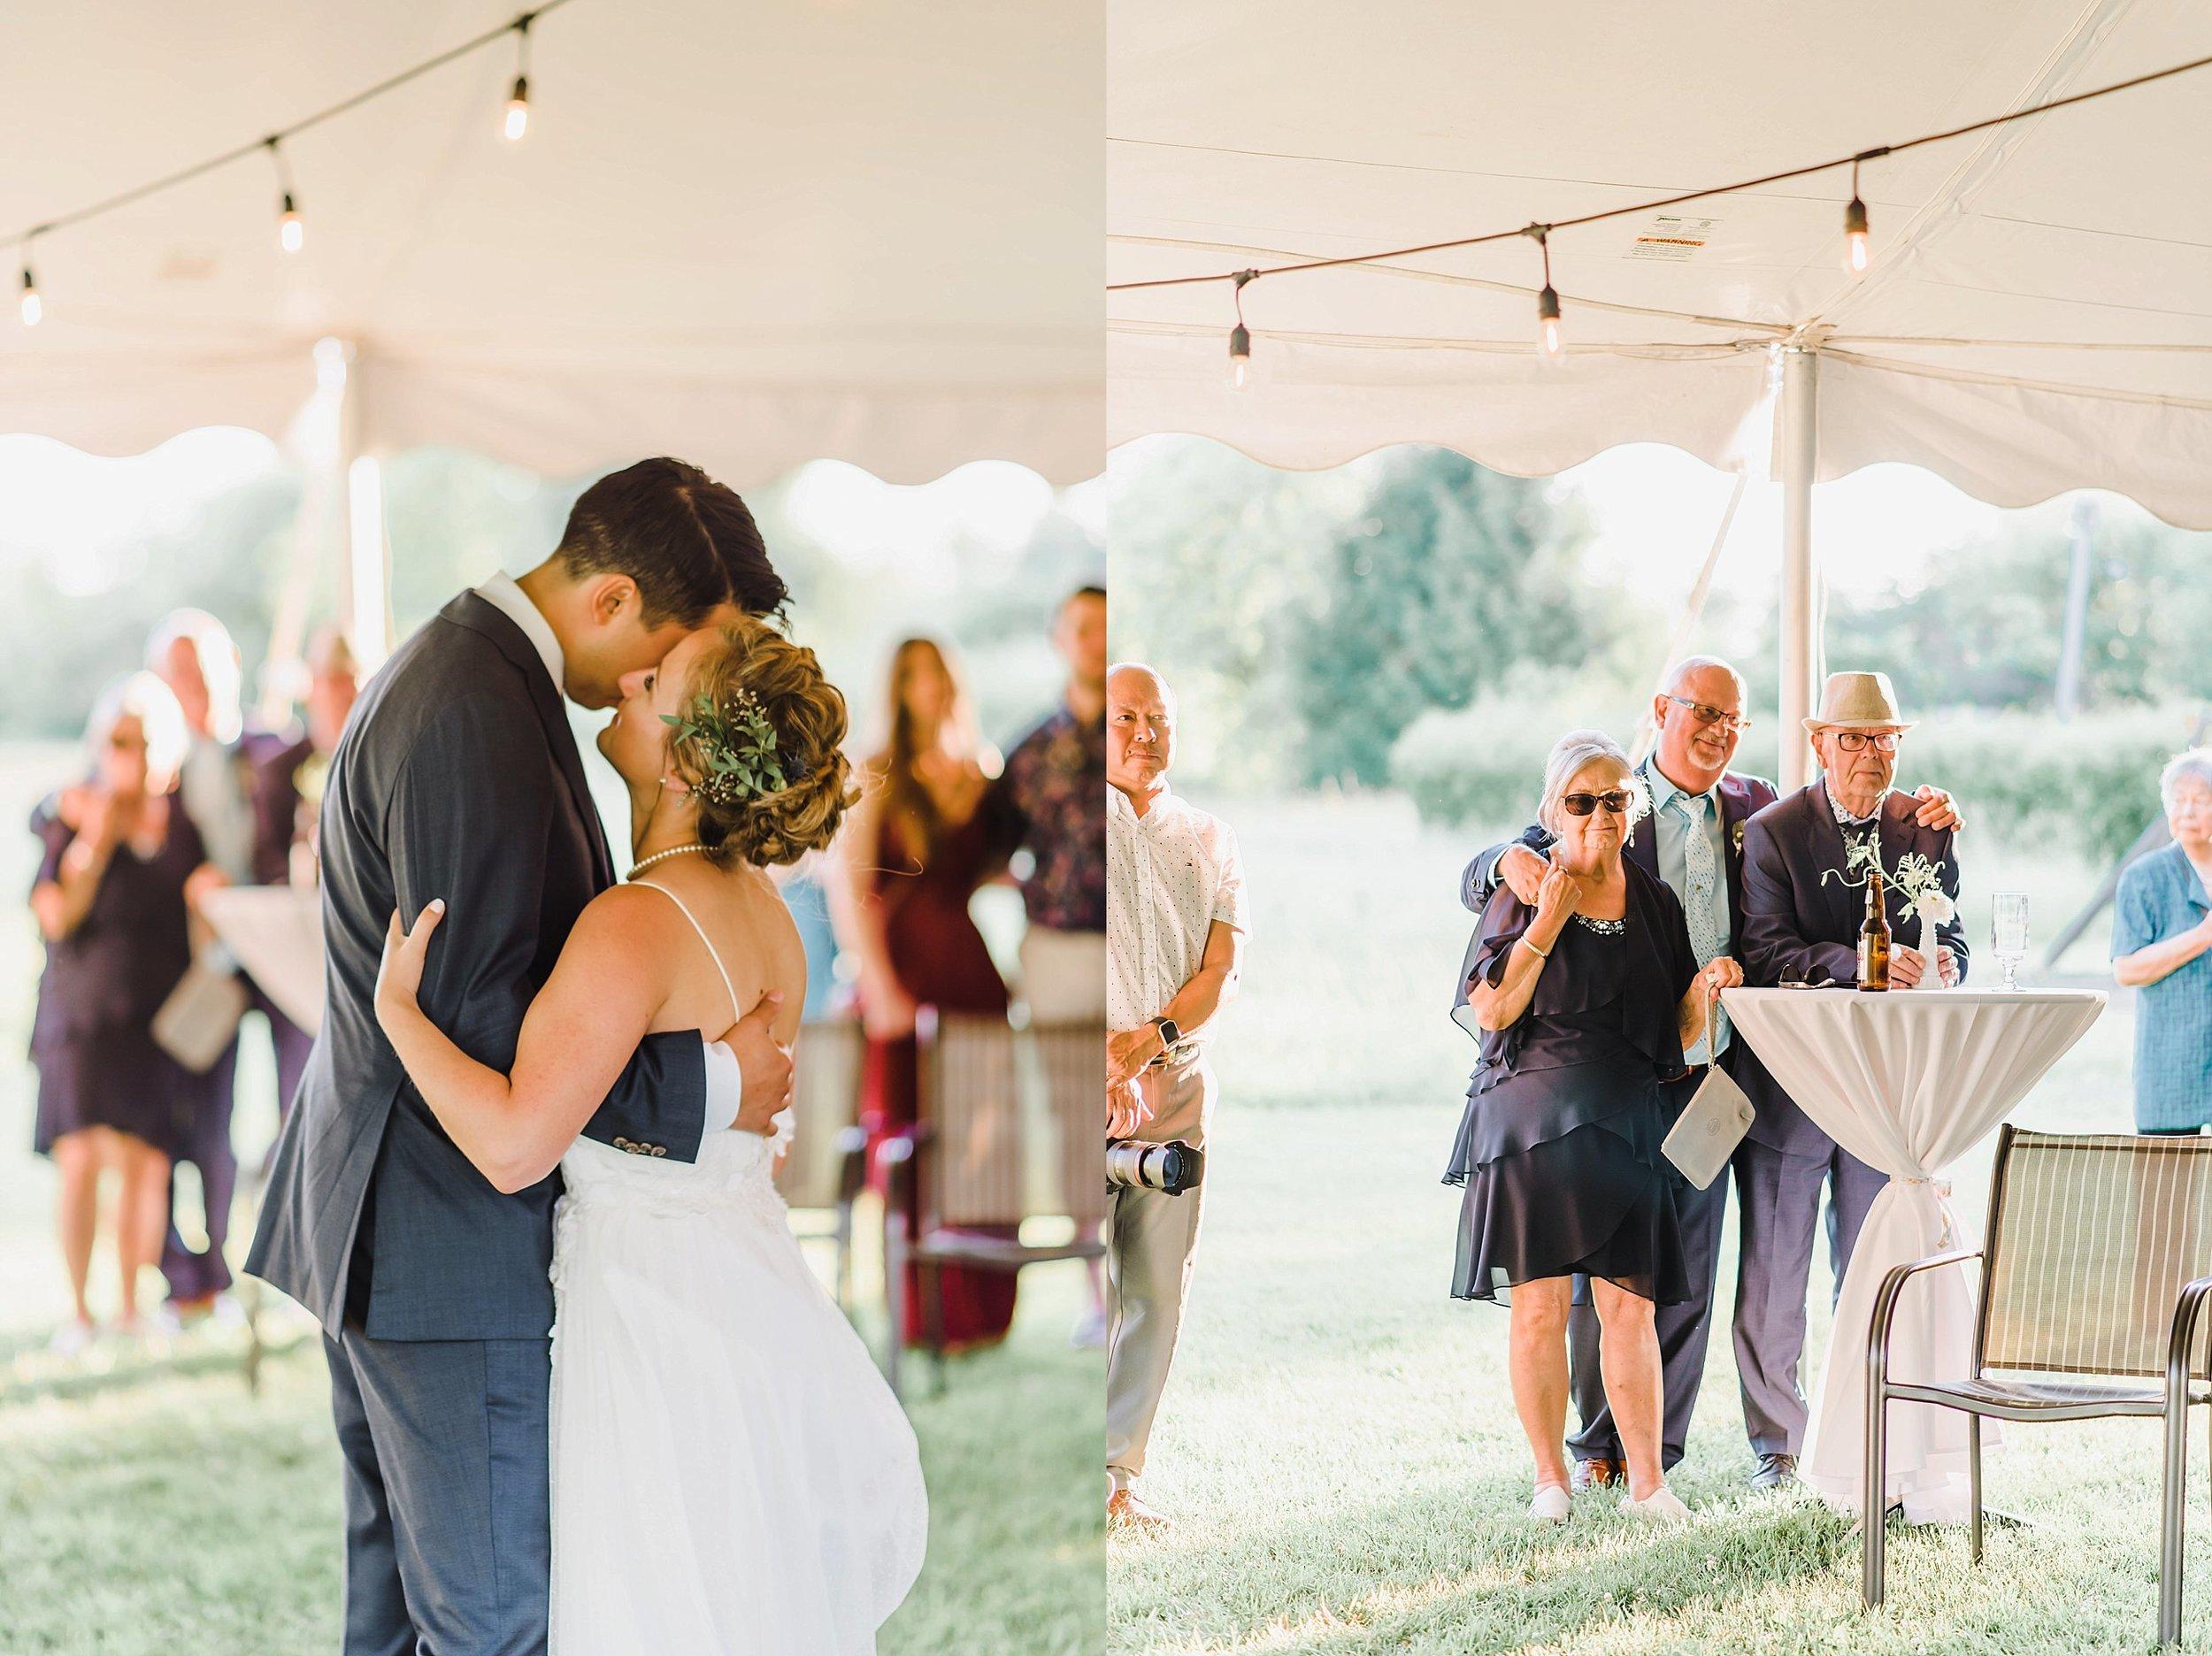 light airy indie fine art ottawa wedding photographer | Ali and Batoul Photography_0893.jpg